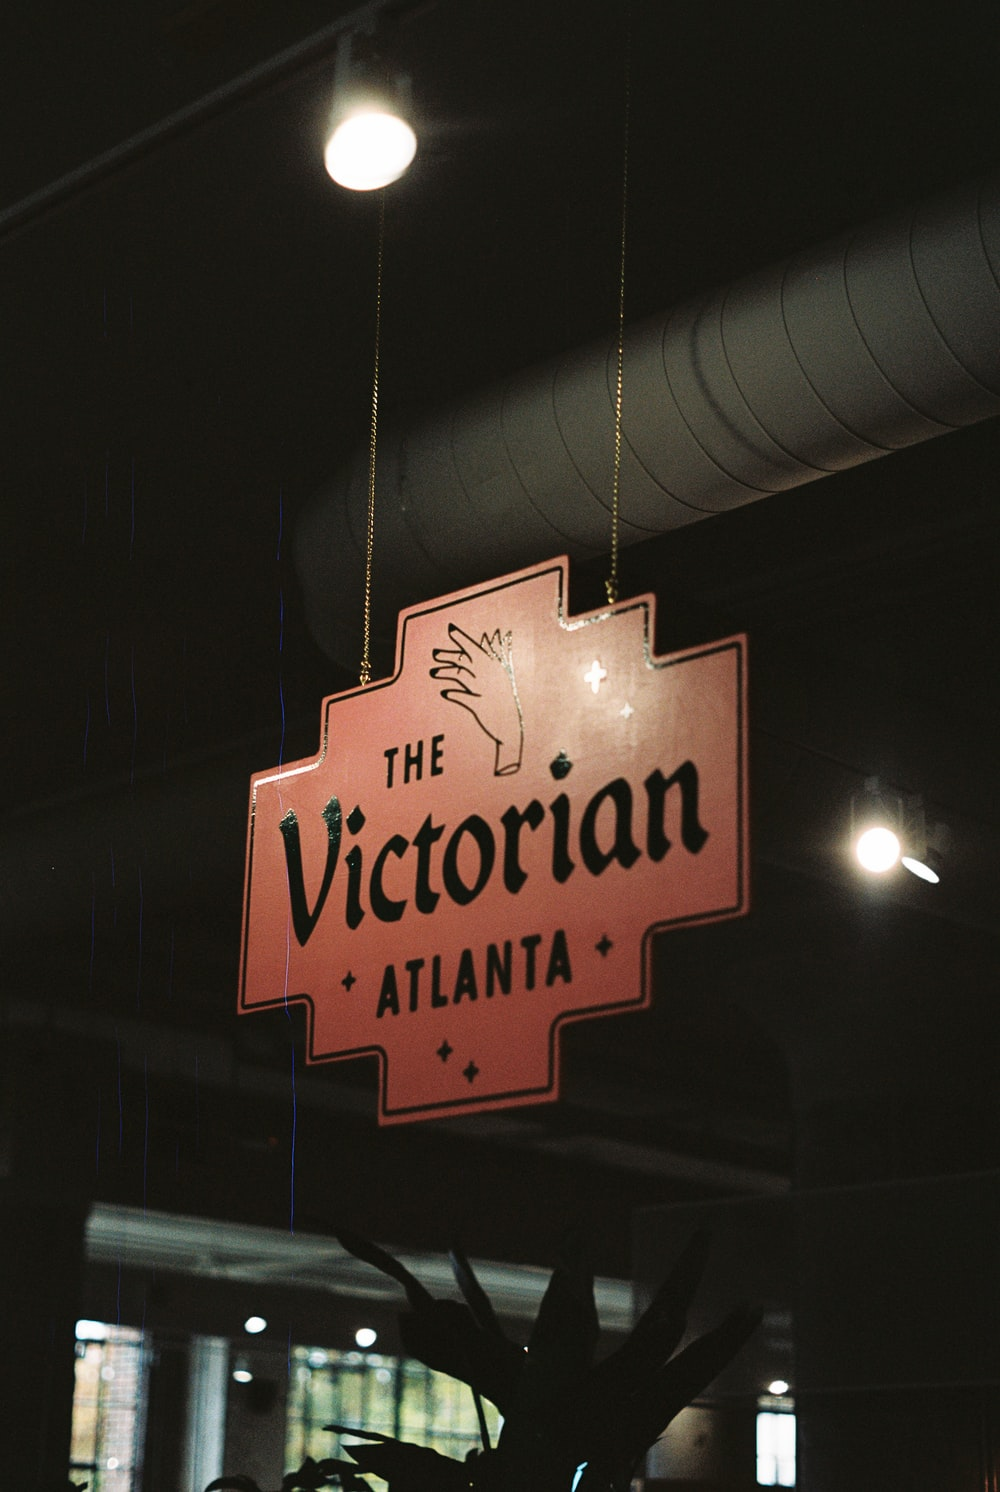 The Victorian Atlanta sign